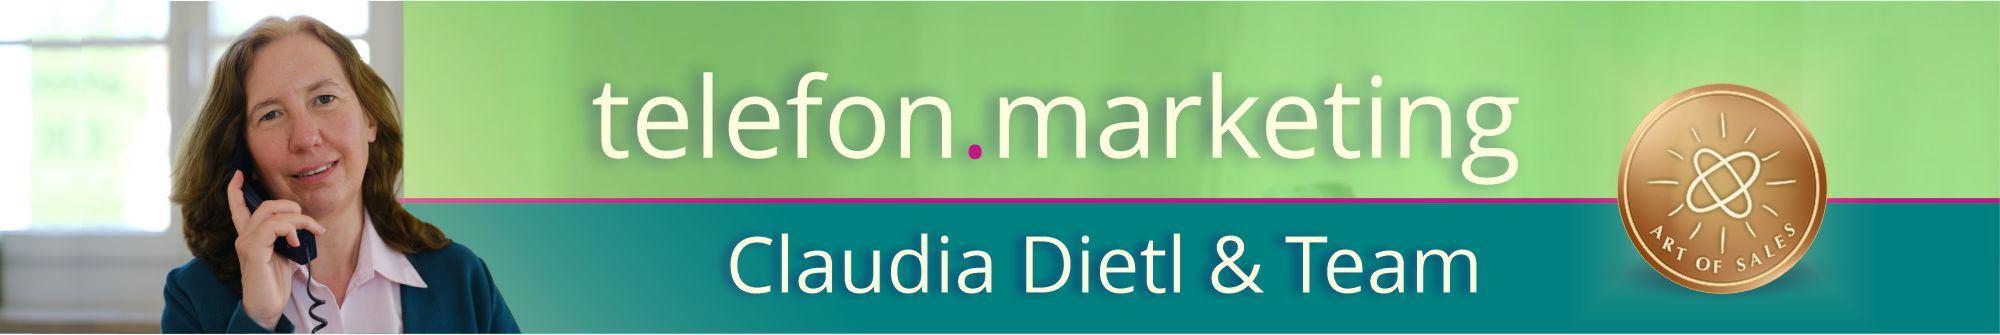 Claudia Dietl - telefon.marketing